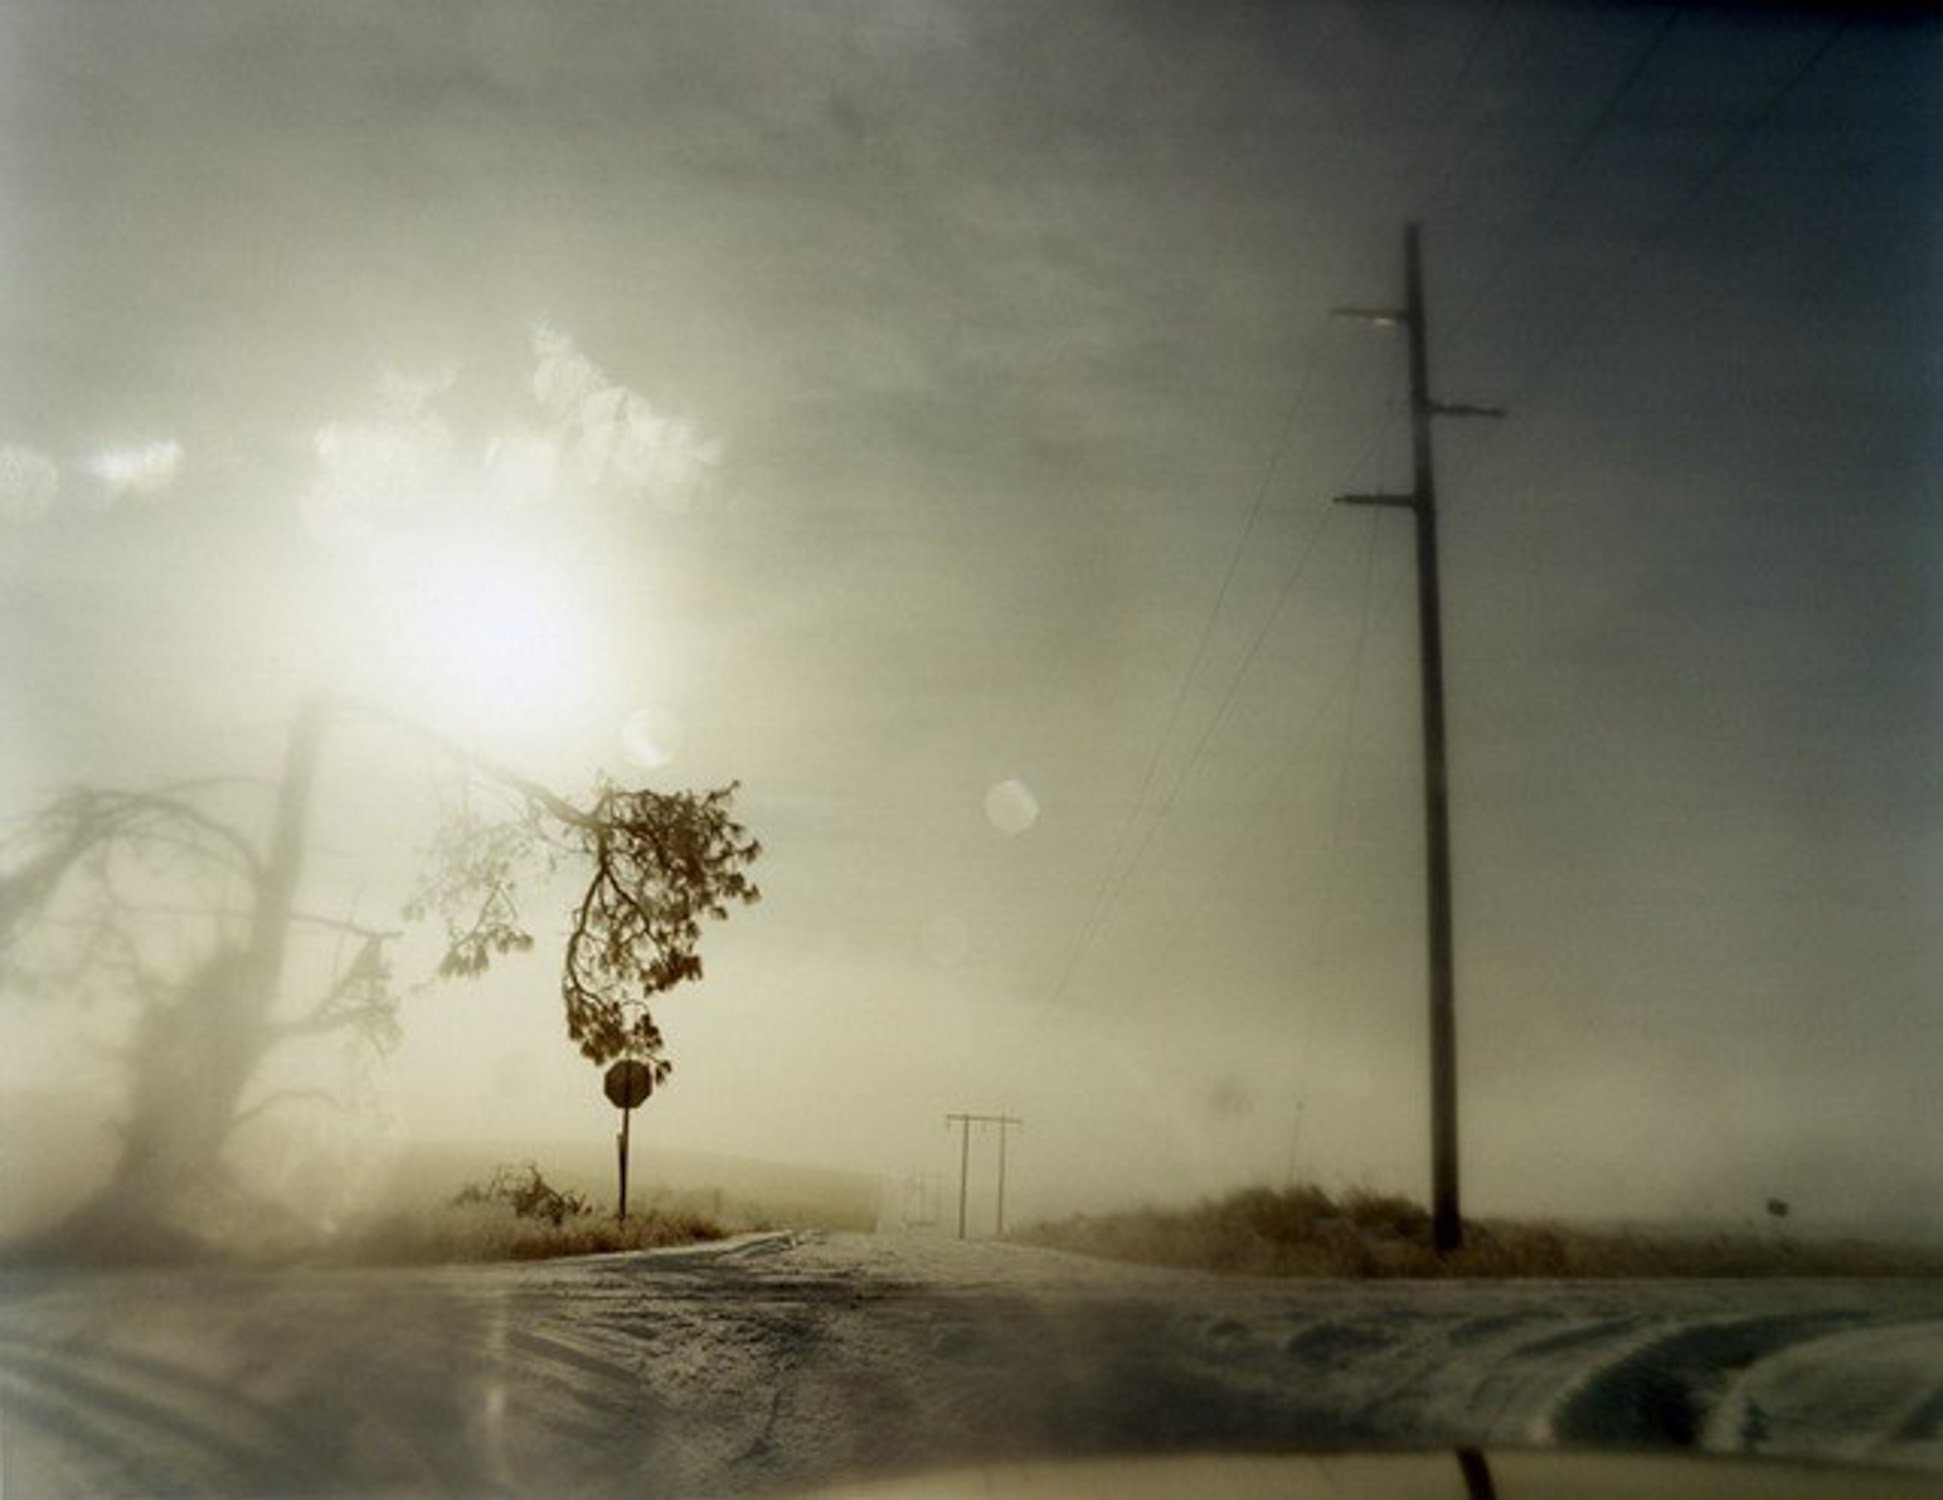 STYLE: PICTORIALIST